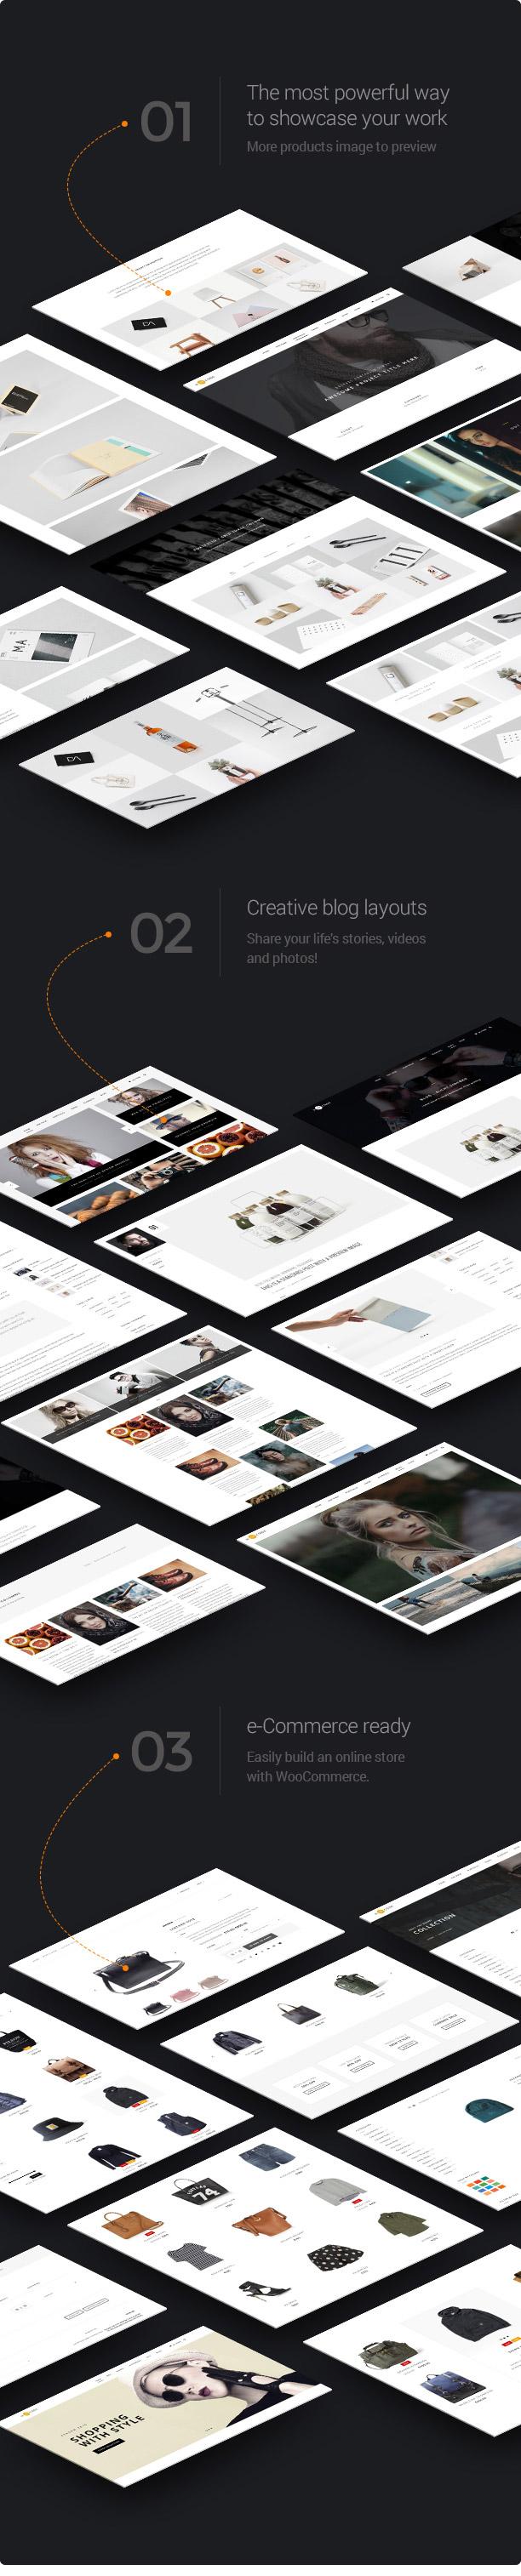 wp h code designs new - H-Code Responsive & Multipurpose WordPress Theme